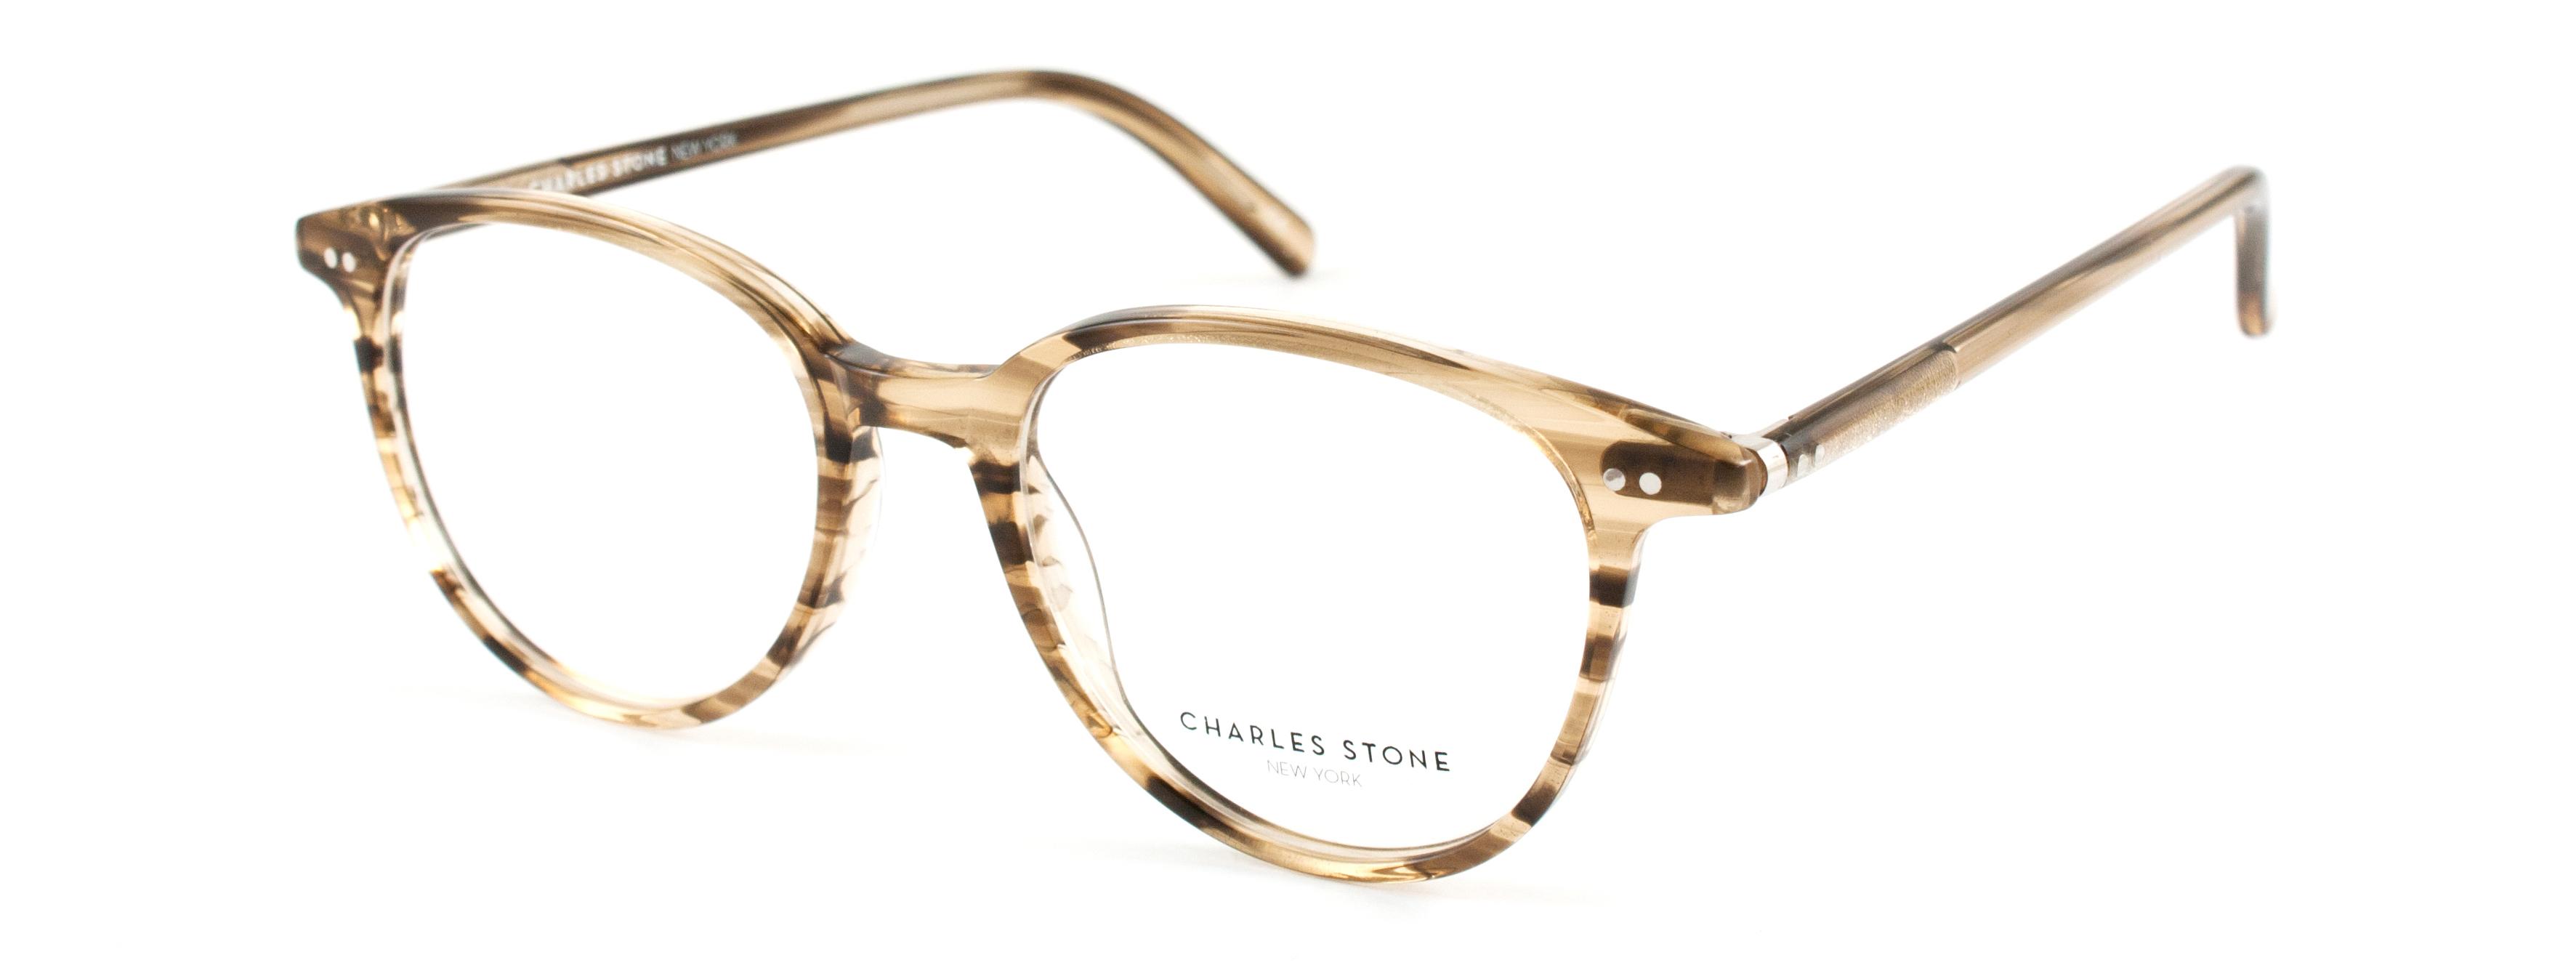 charles stone brillen muenchen - Charles Stone